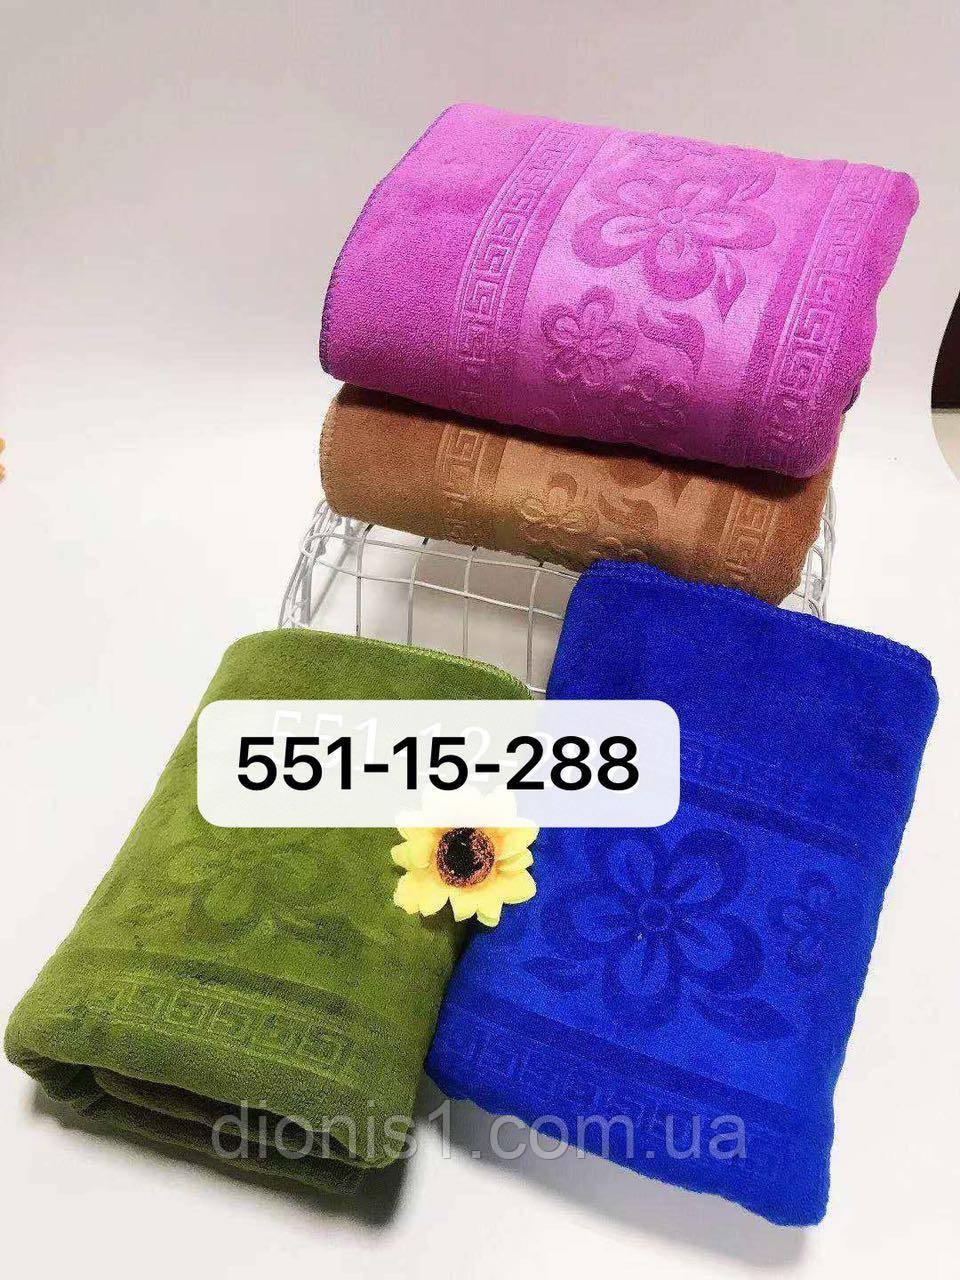 Кухонное полотенце, состав: фибра, размер 35*70 кол-во 288 шт